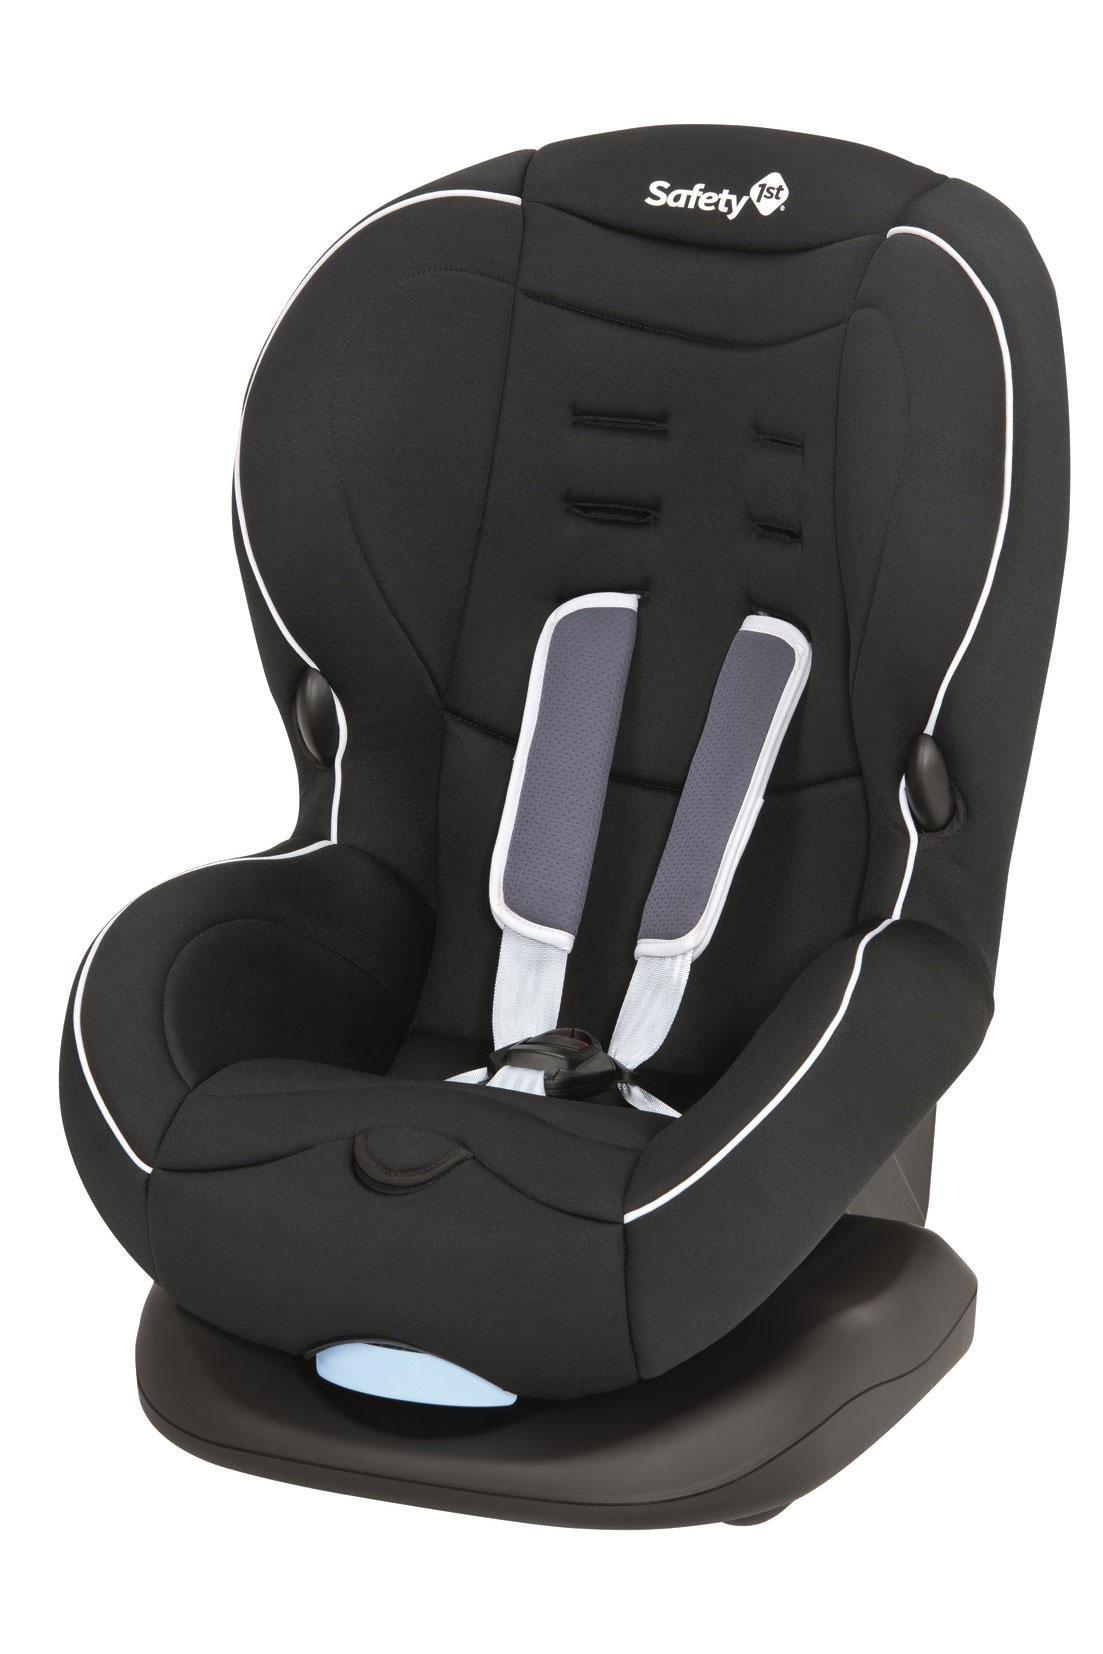 safety 1st 75407640 baby cool plus kinderautositz gruppe 1 ab ca 9 monate bis 3 5 jahre. Black Bedroom Furniture Sets. Home Design Ideas